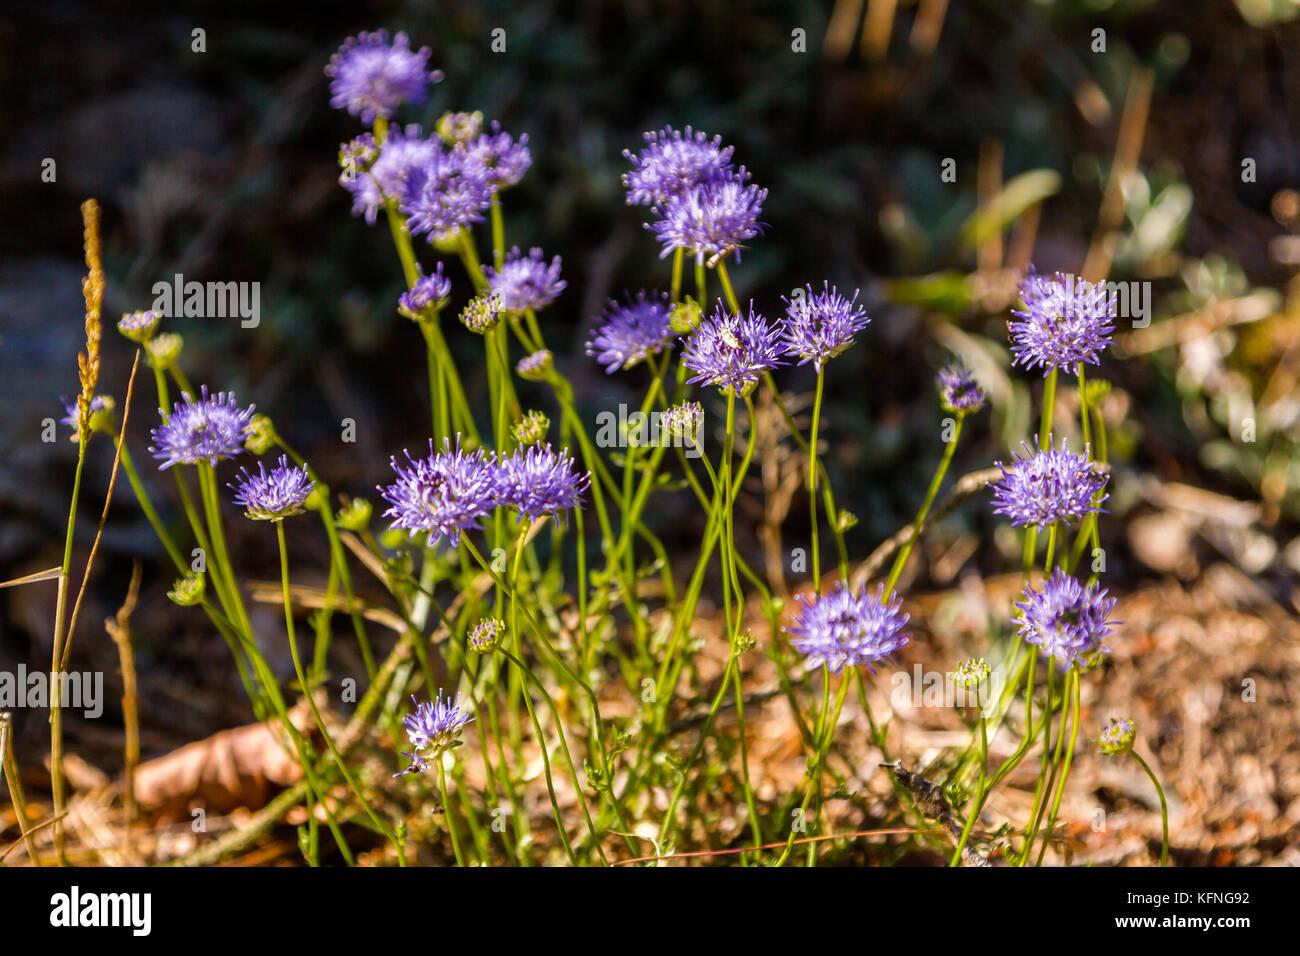 lila blühende Pflanzen - Stock Image